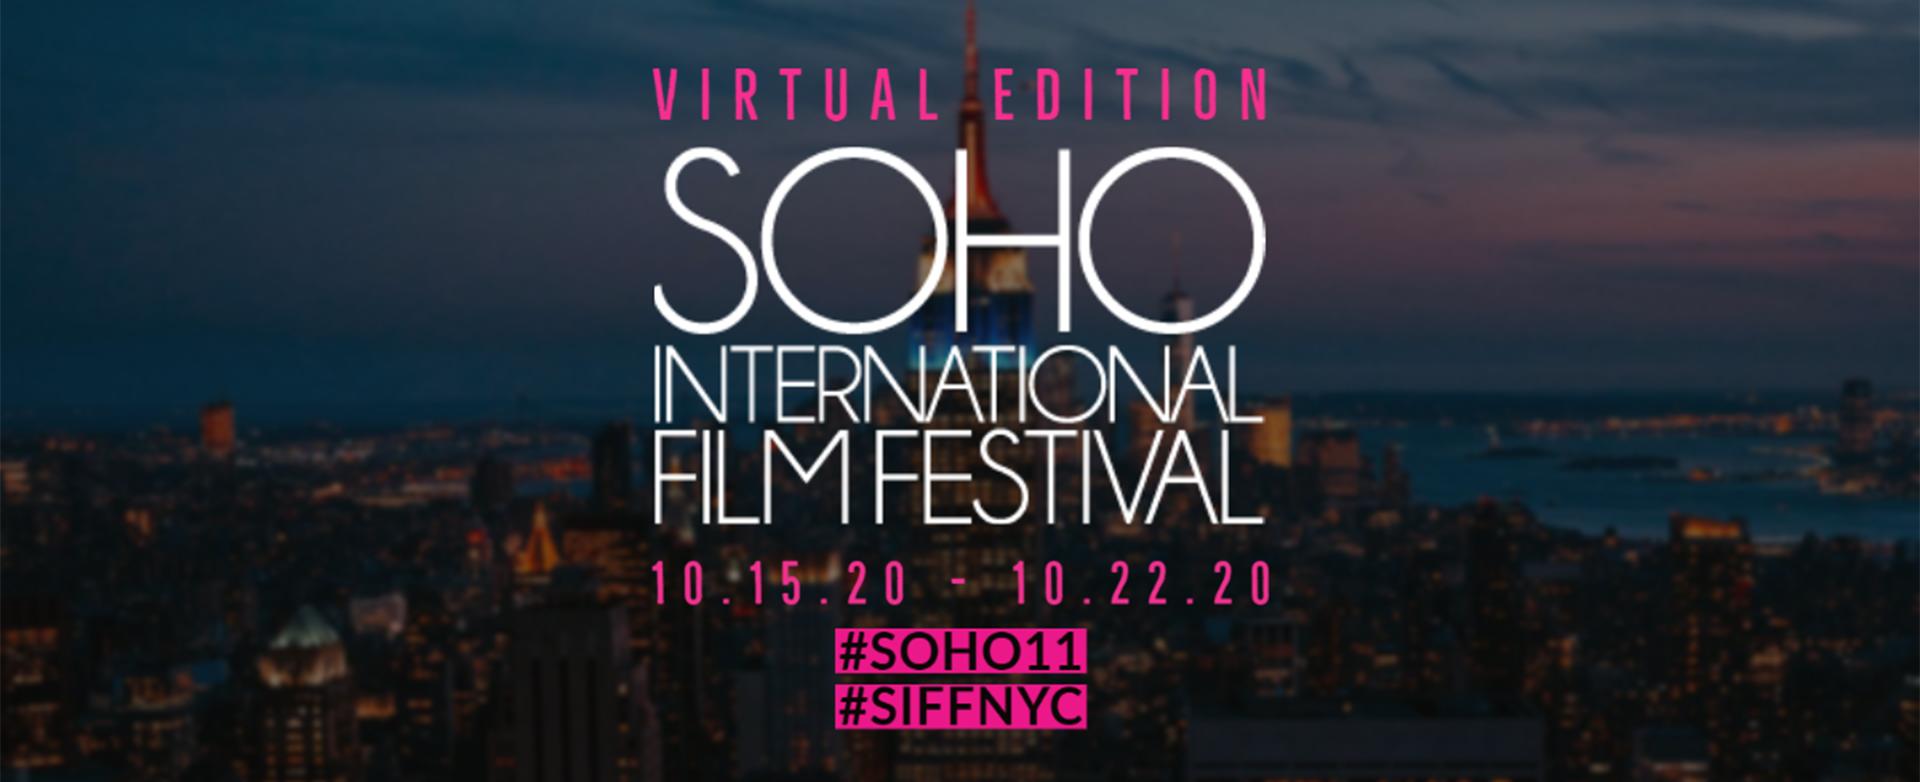 2020 SOHO INTERNATIONAL FILM FESTIVAL: VIRTUAL EDITION